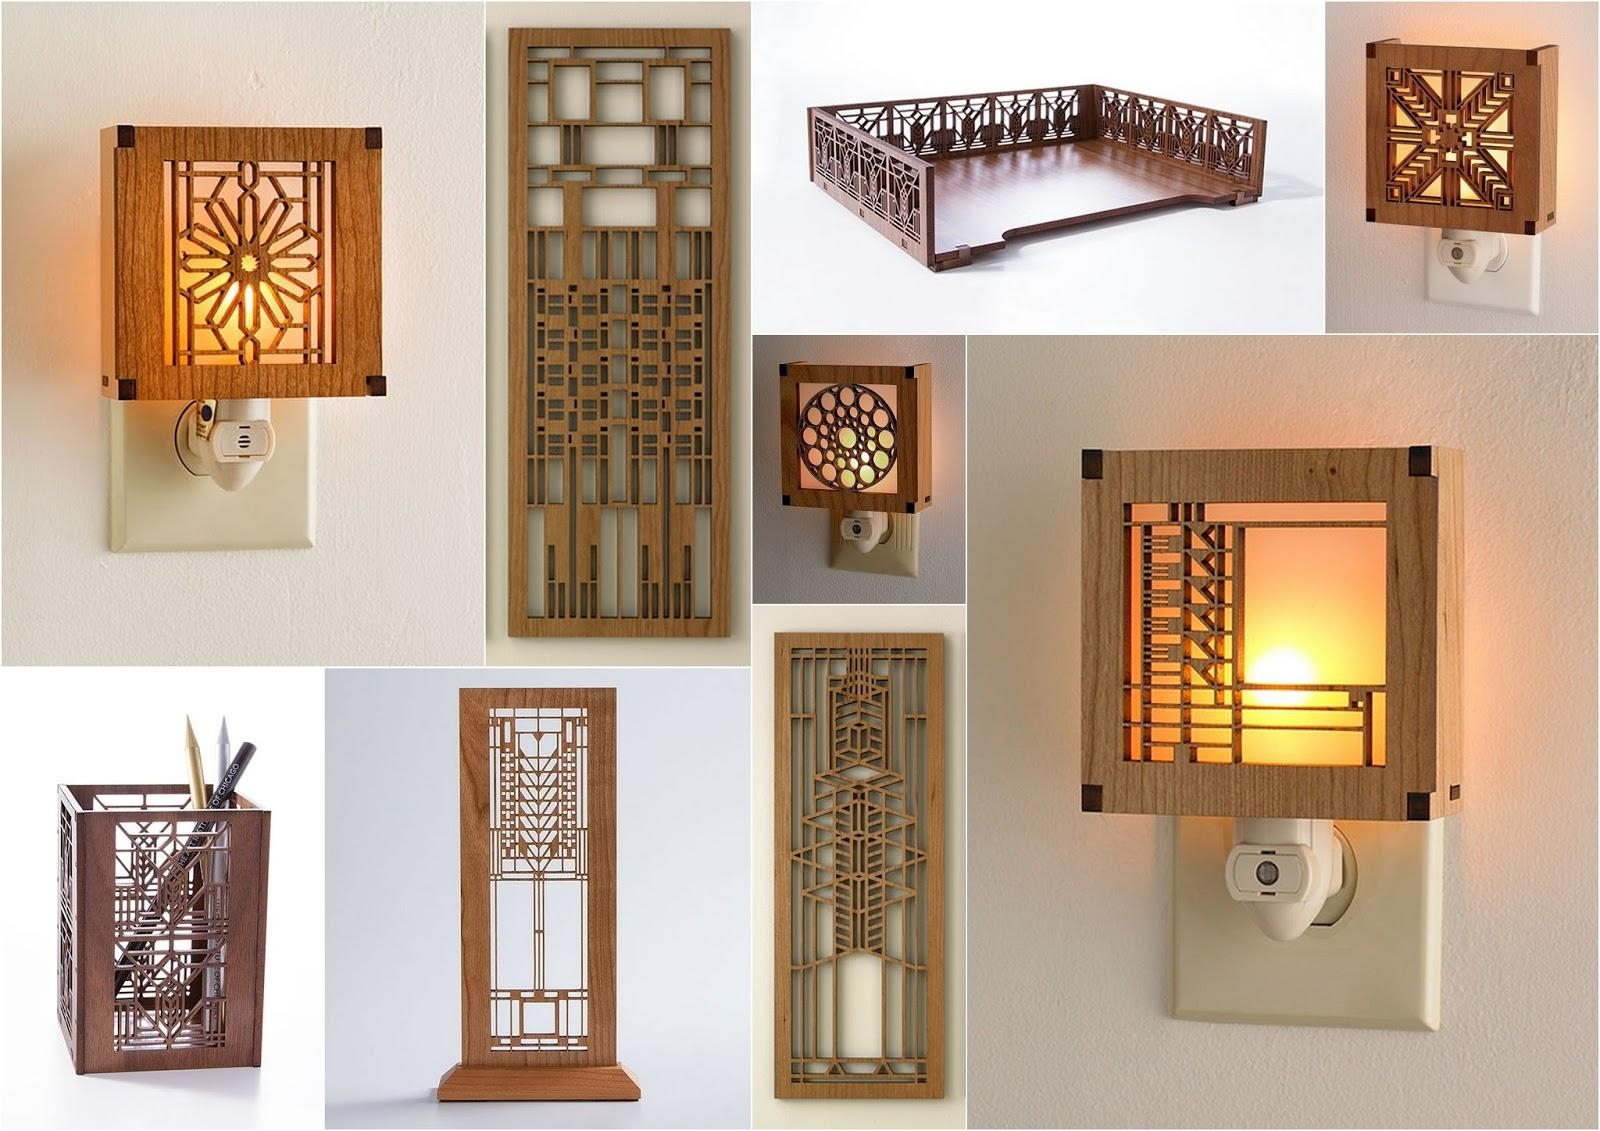 Artifacts: How It's Made : Laser Cut Frank Lloyd Wright® Designs Regarding Frank Lloyd Wright Wall Art (Photo 6 of 20)